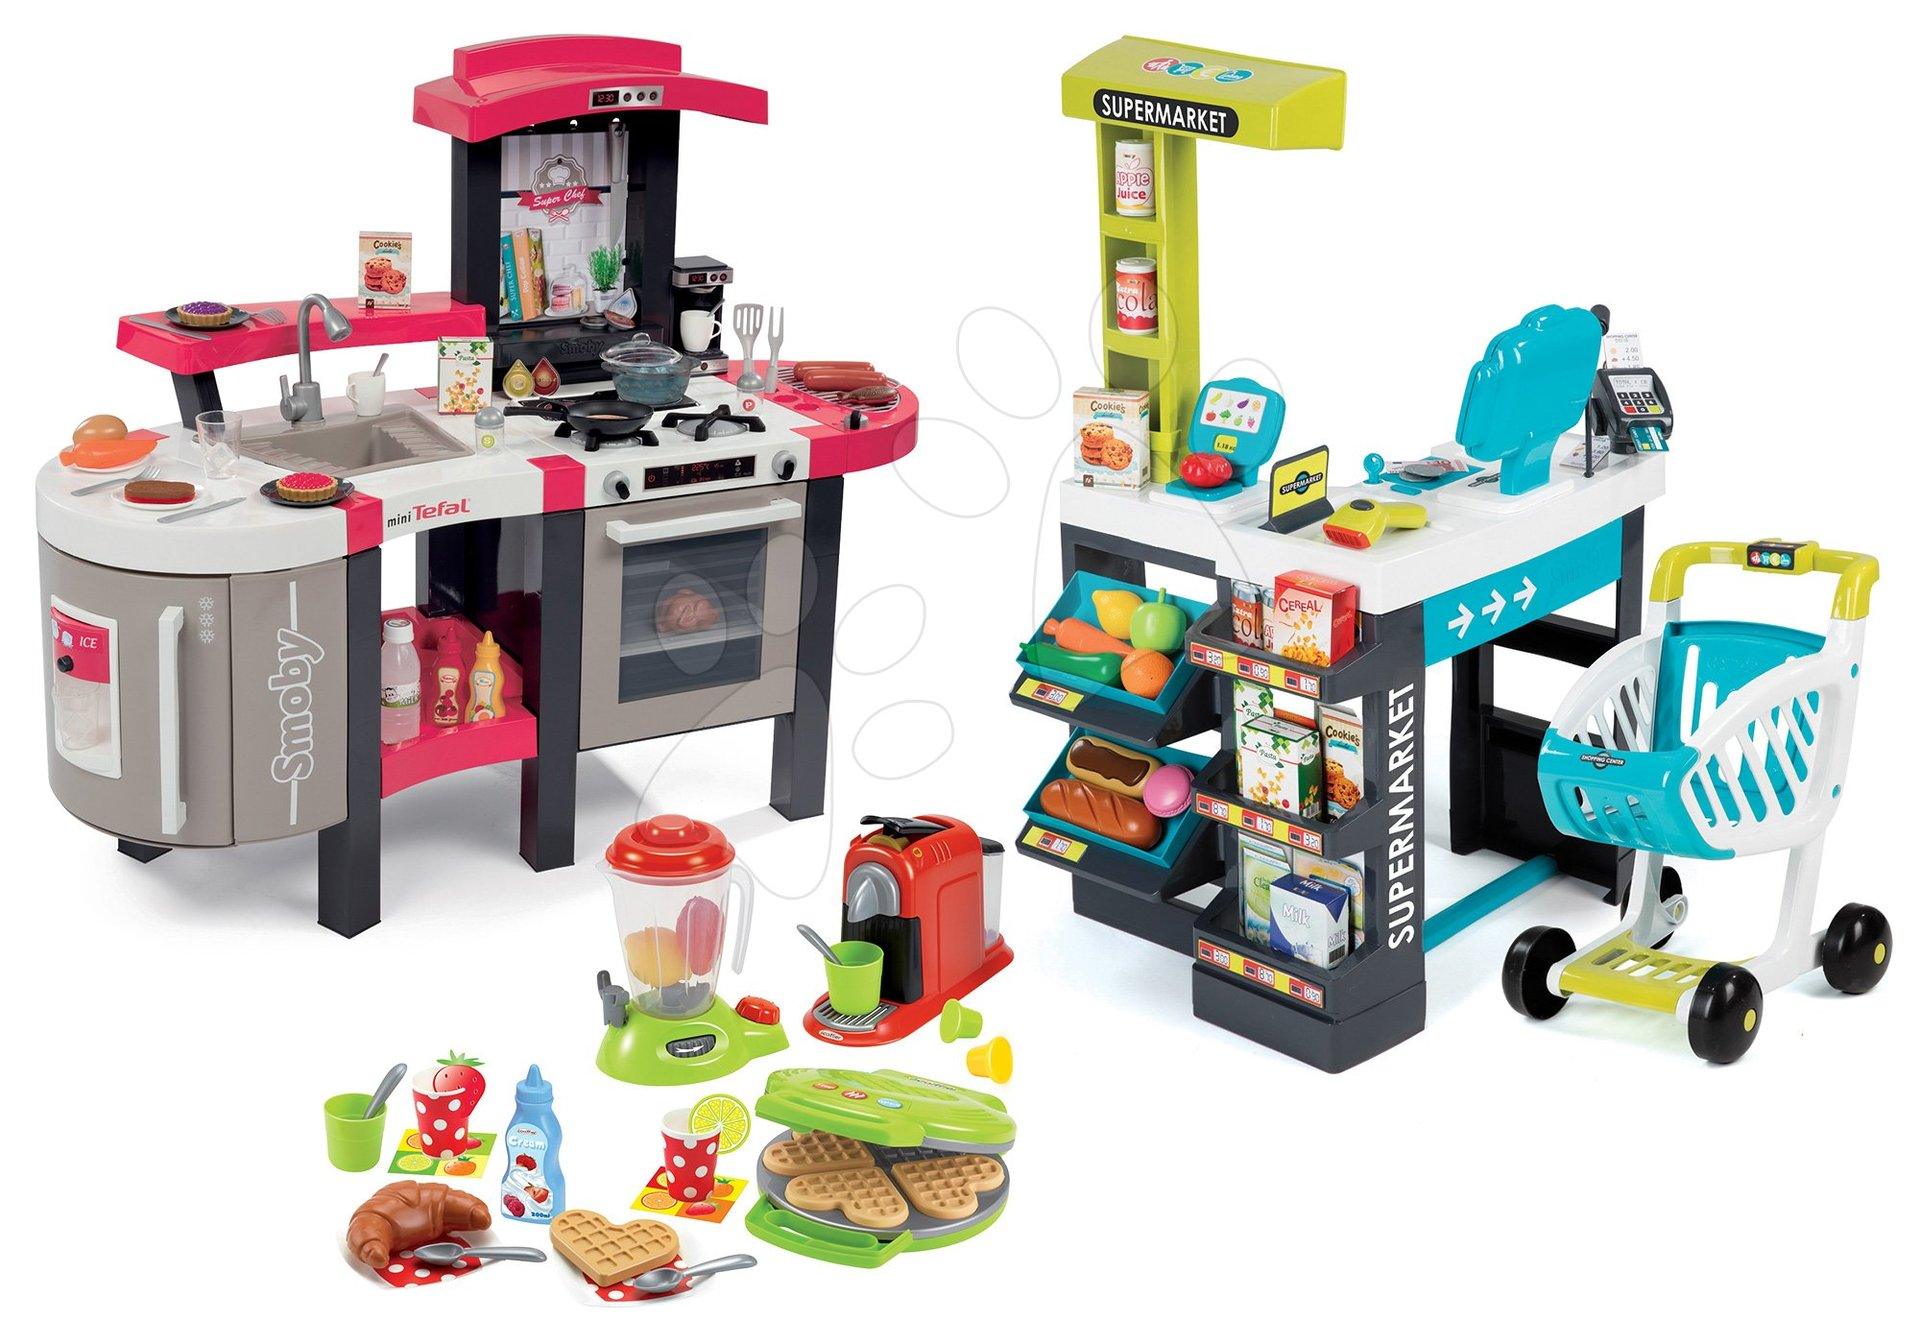 Kuchynky pre deti sety - Set kuchynka Tefal SuperChef Smoby s grilom a kávovarom a obchod Supermarket s dotykovou pokladňou